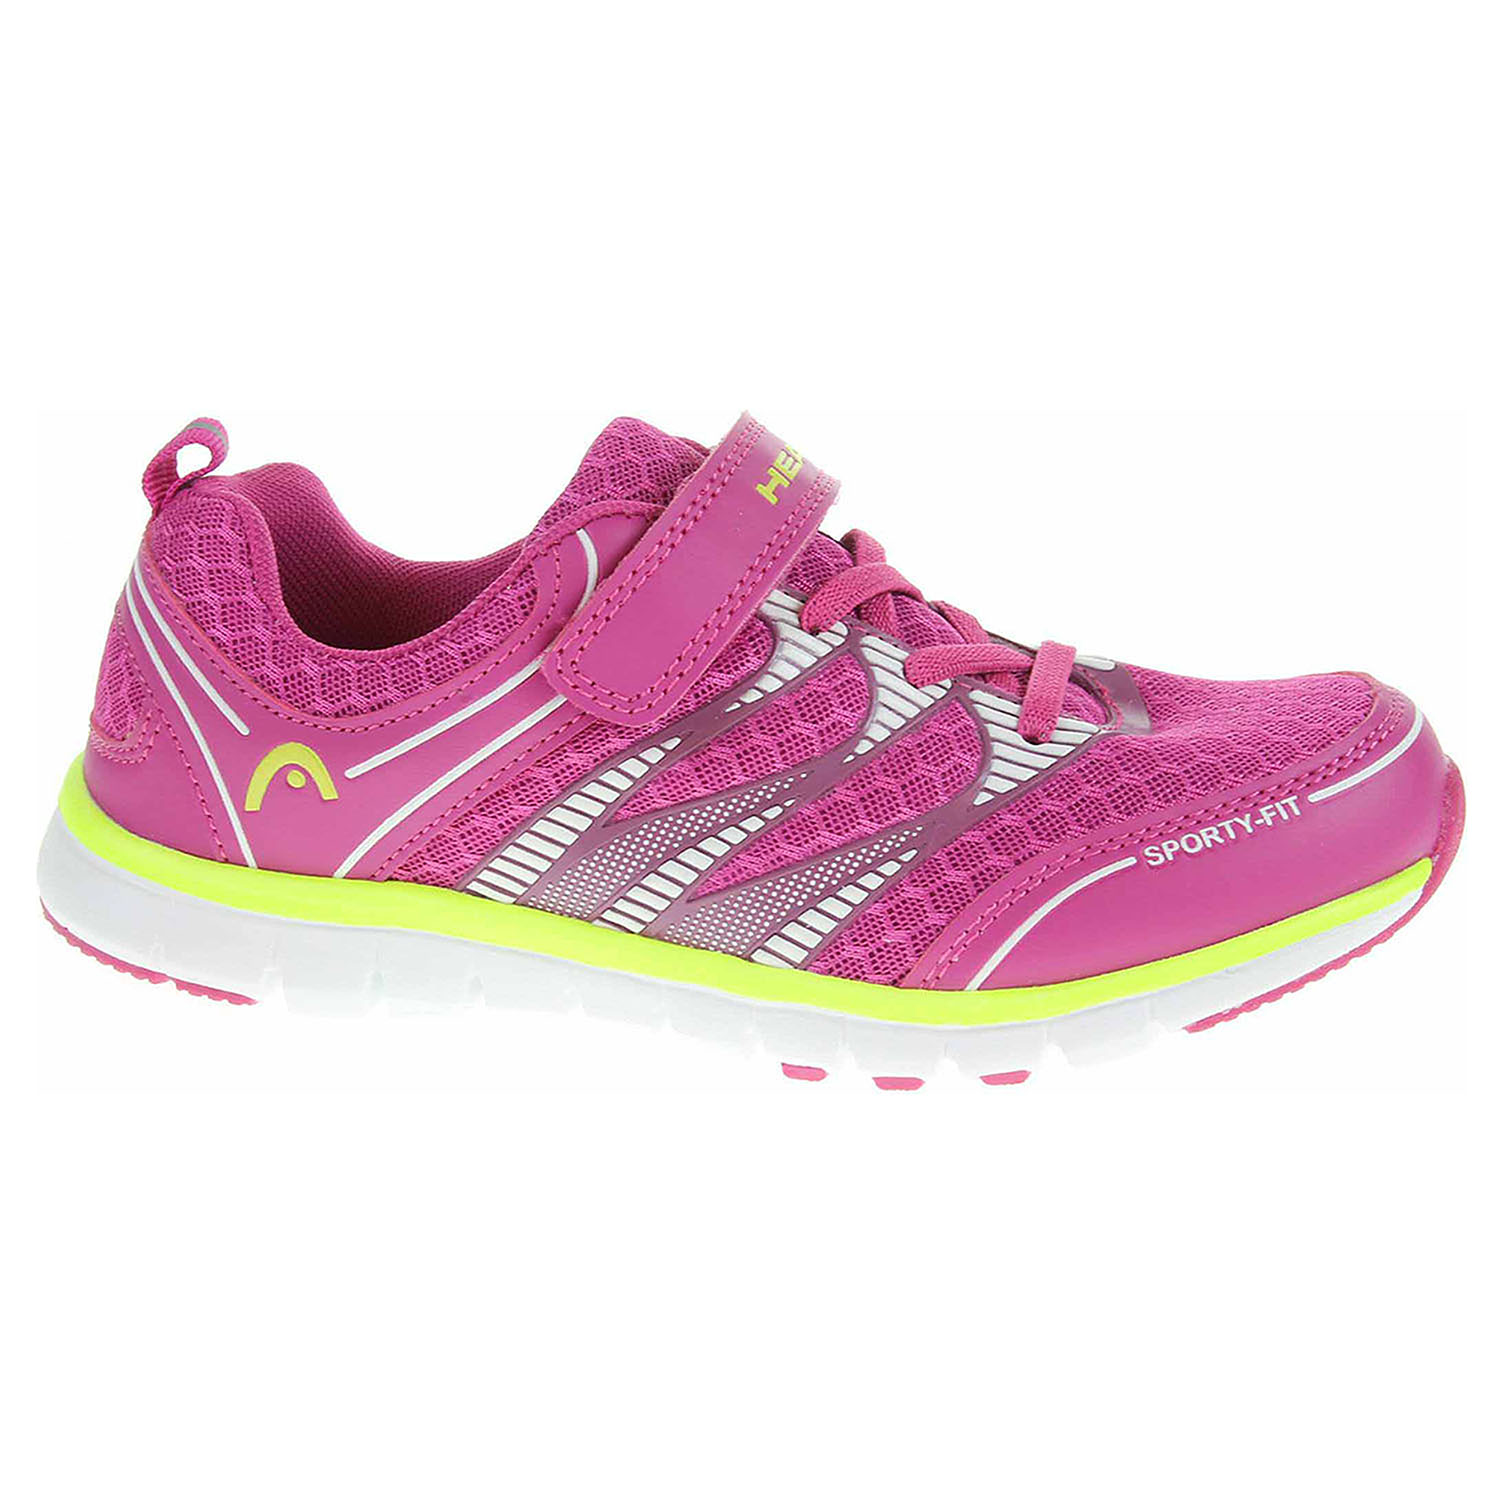 Dívčí obuv Head HW-507-25-01 růžová HW-507-25-01 31